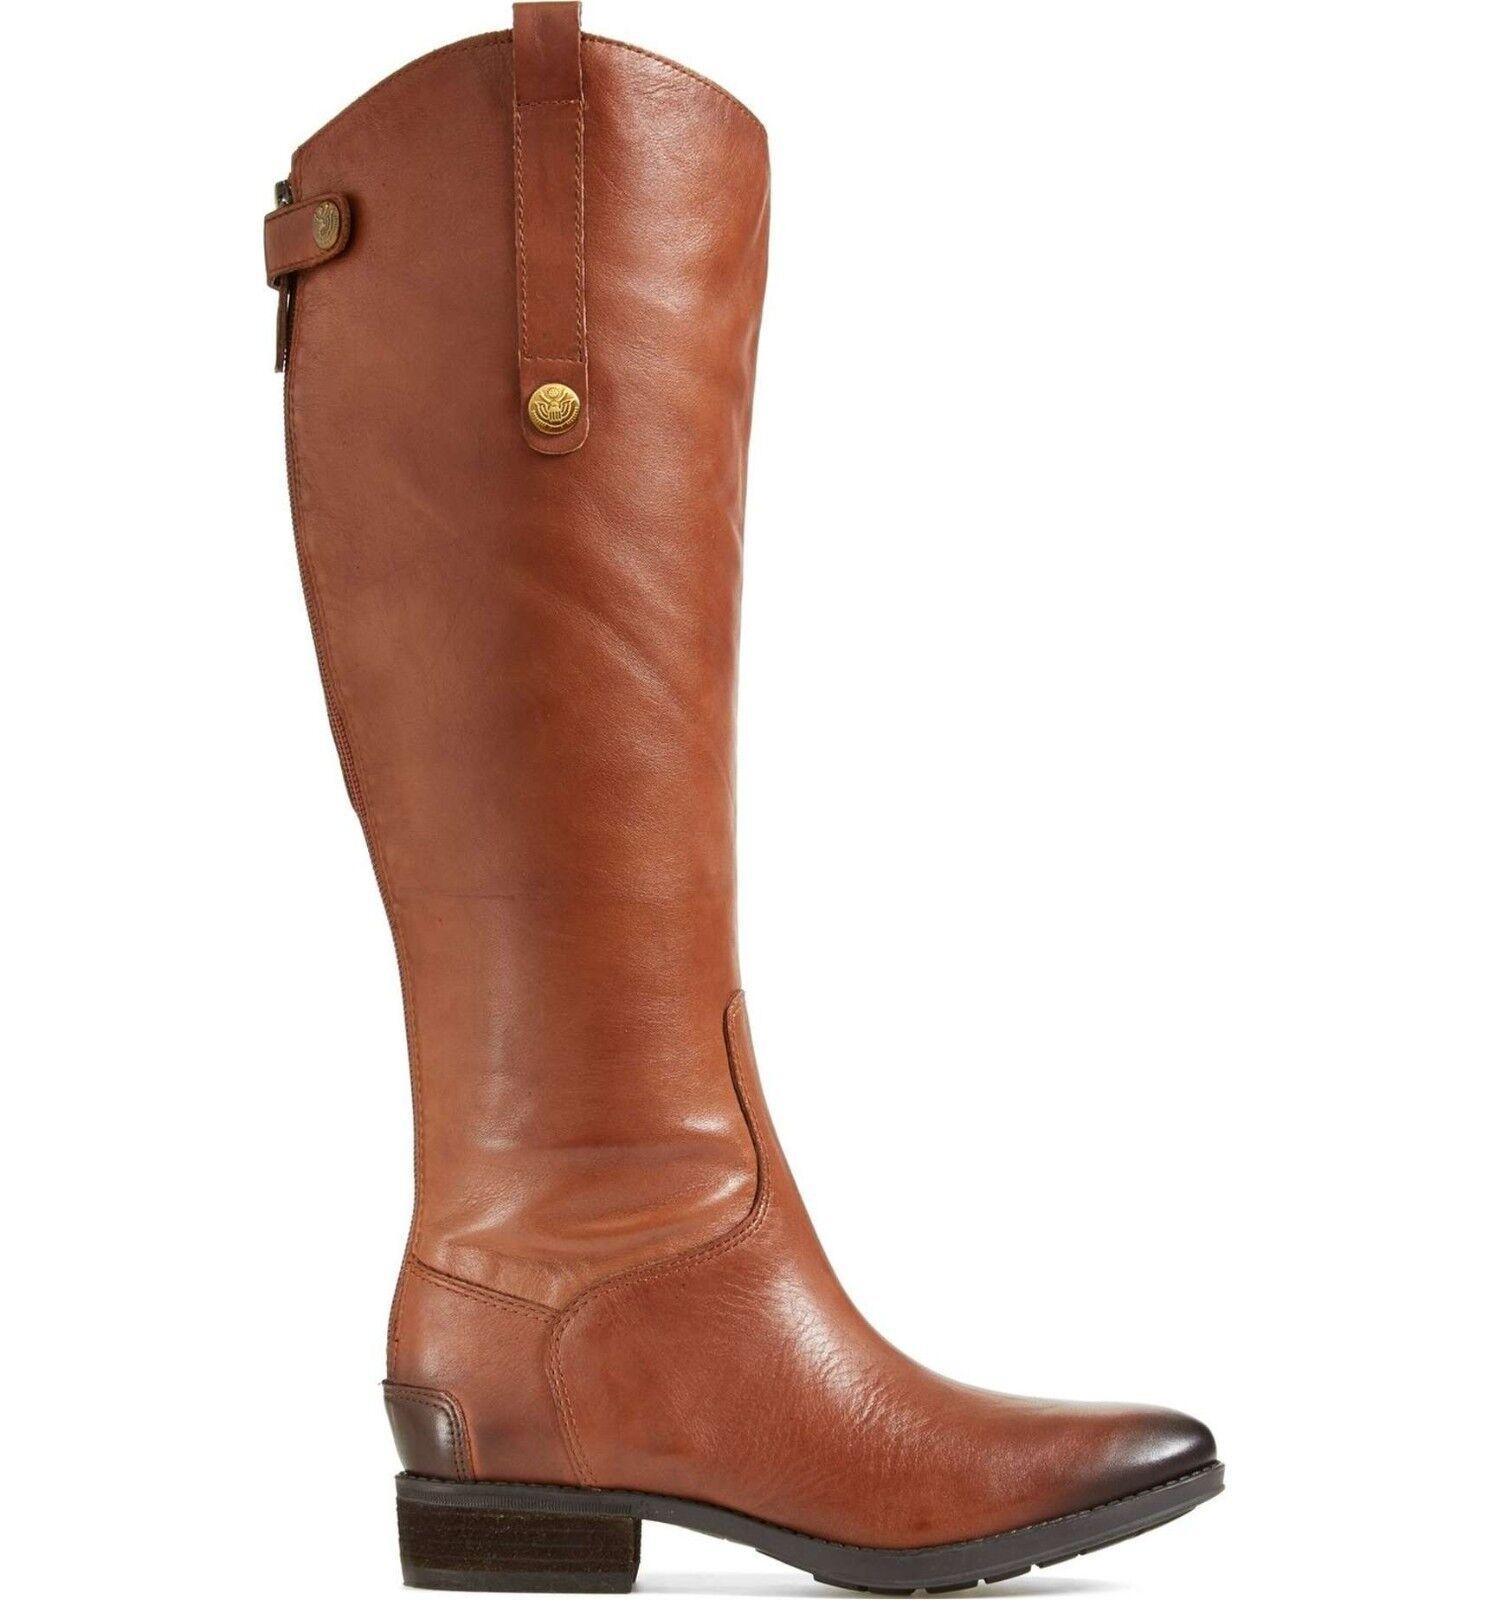 SAM EDELMAN EDELMAN EDELMAN Penny 2 Riding Stiefel Wide Calf Whiskey braun 7 7.5 8 8.5 9.5 10 M W 4ee7cd